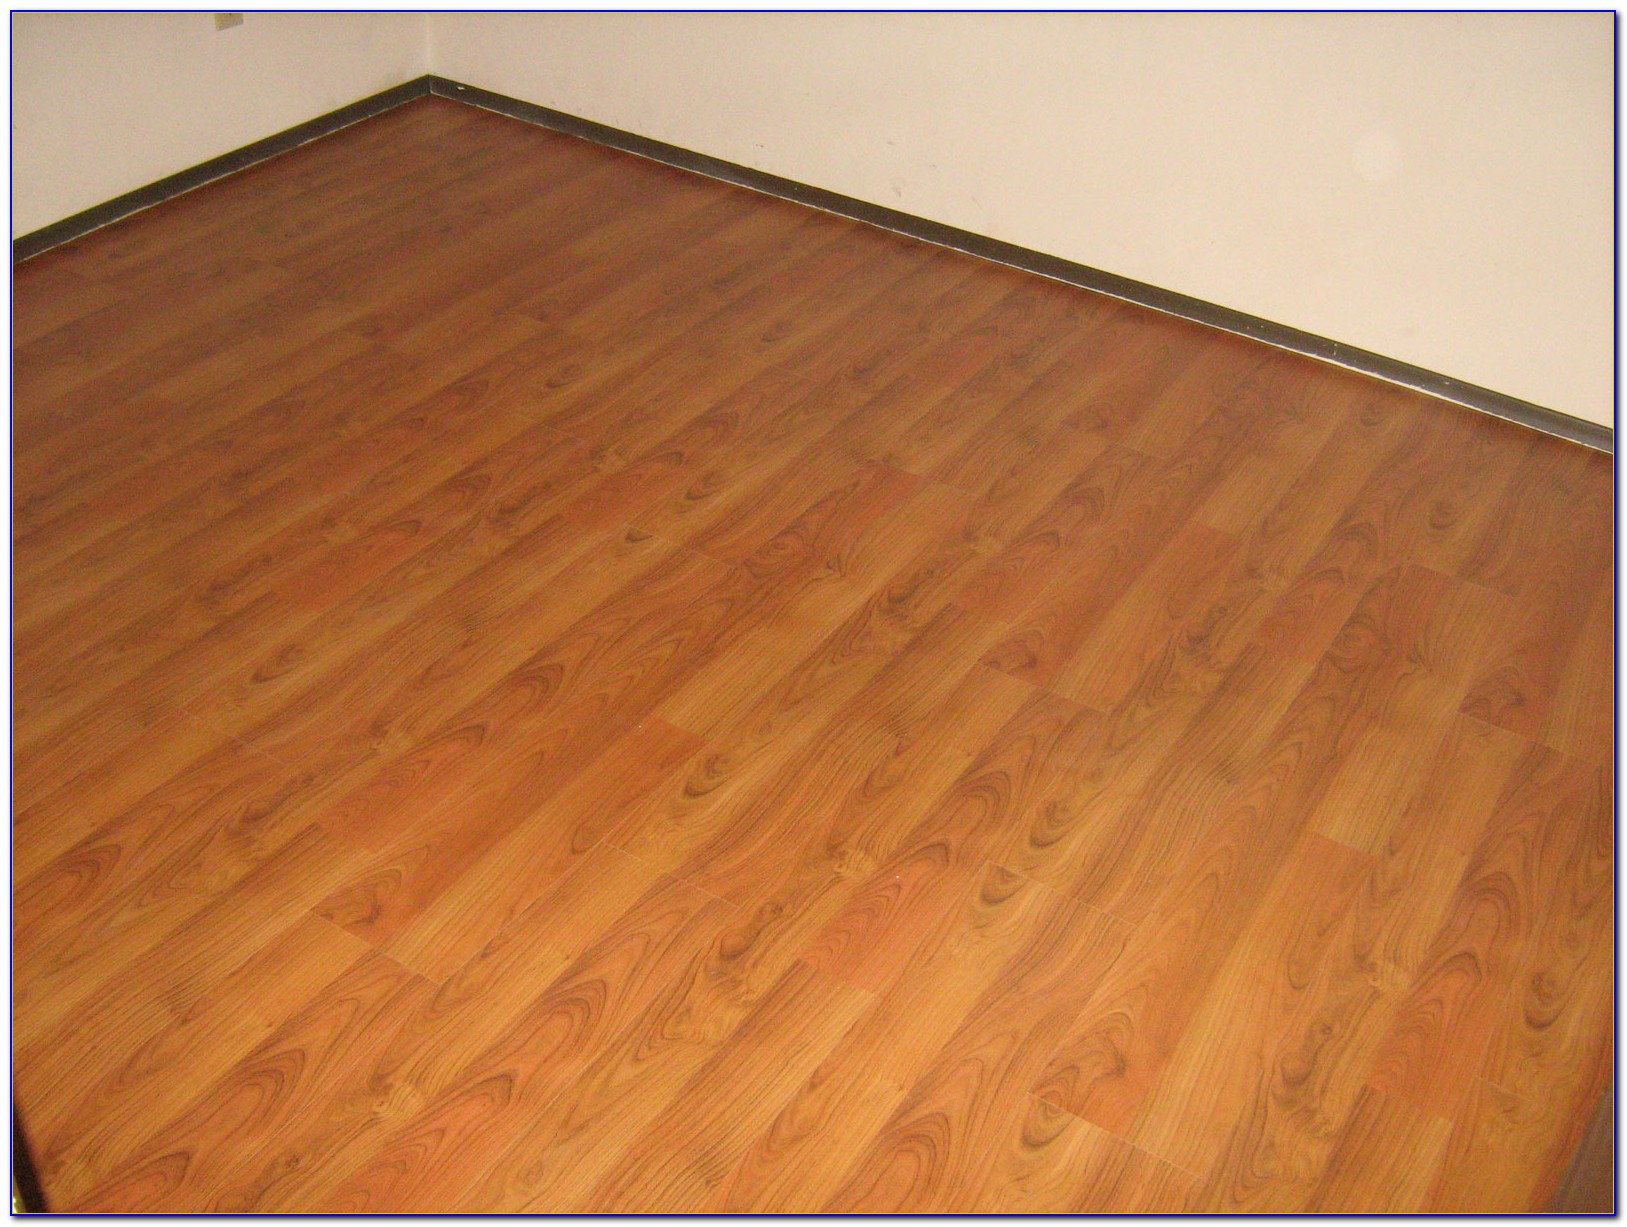 Best Wet Mop For Hardwood Floors 2015